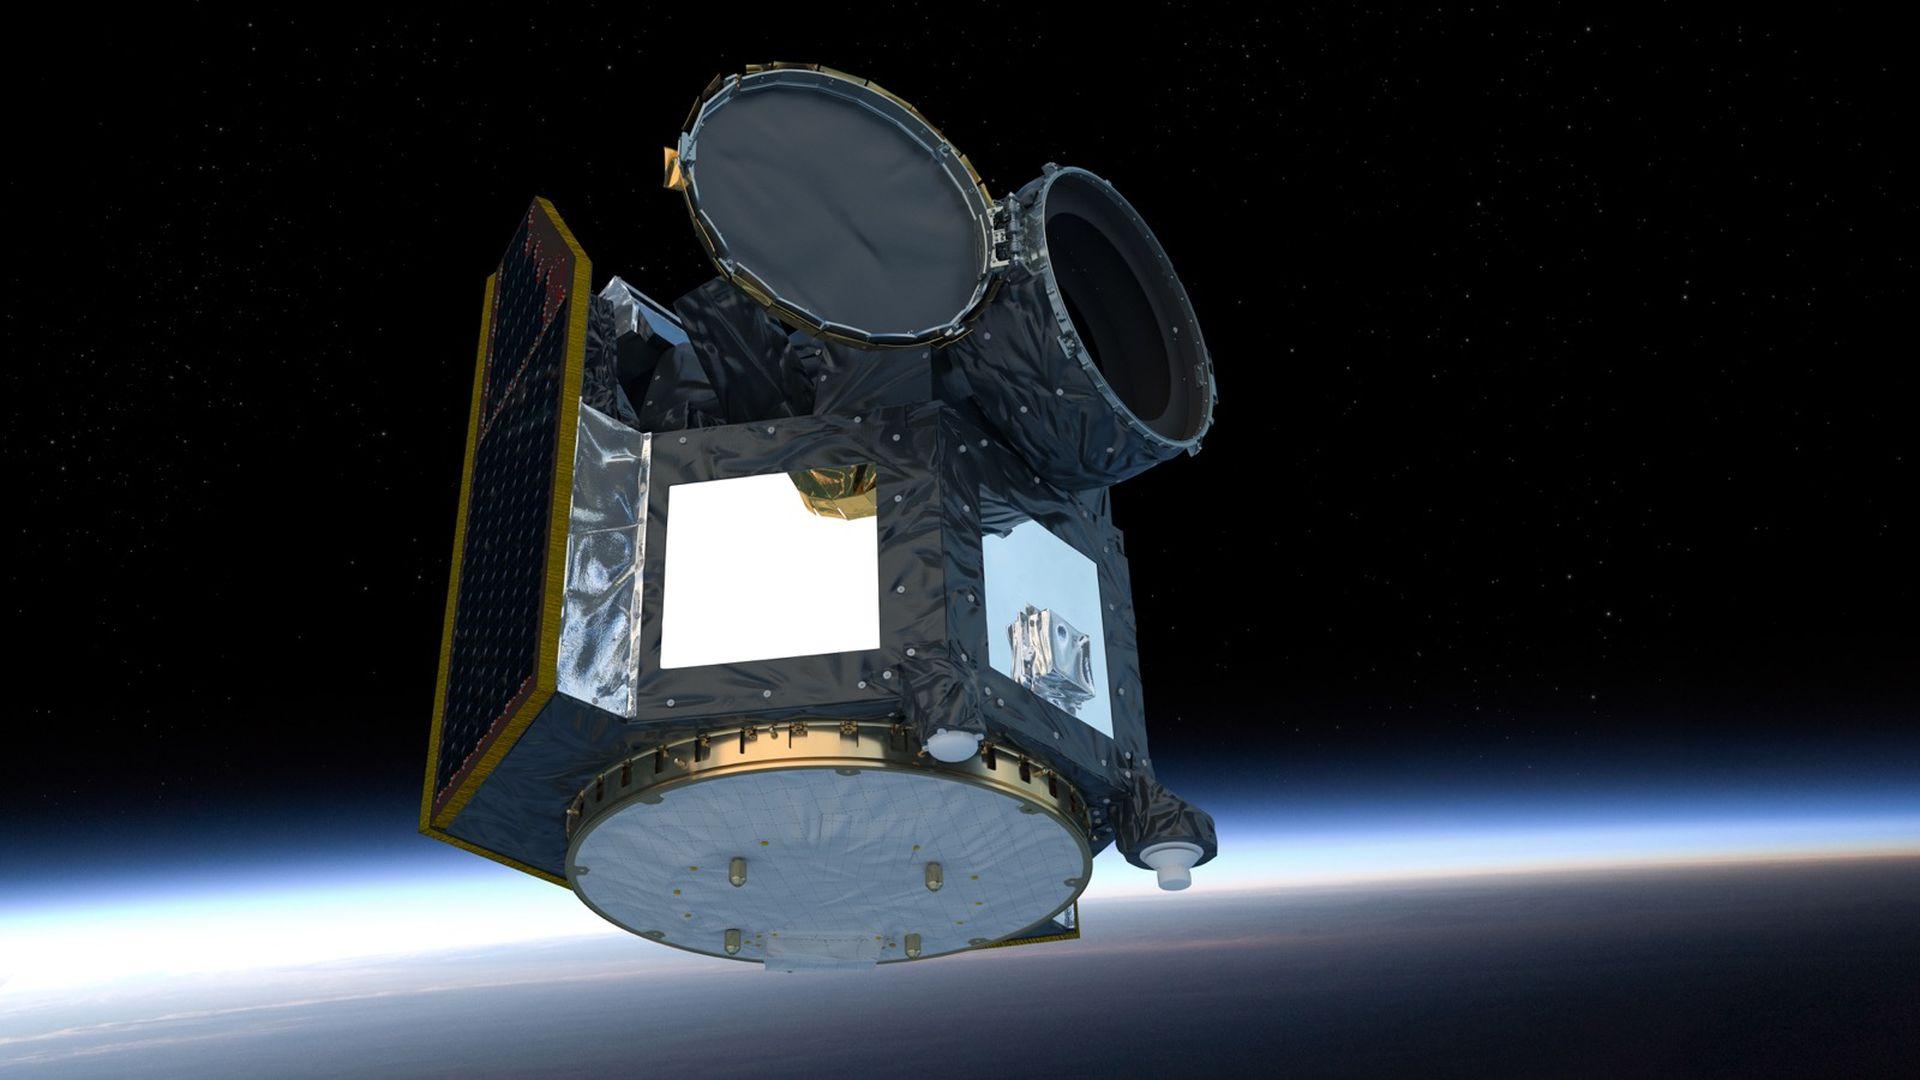 Artist's illustration of the Cheops spacecraft in orbit